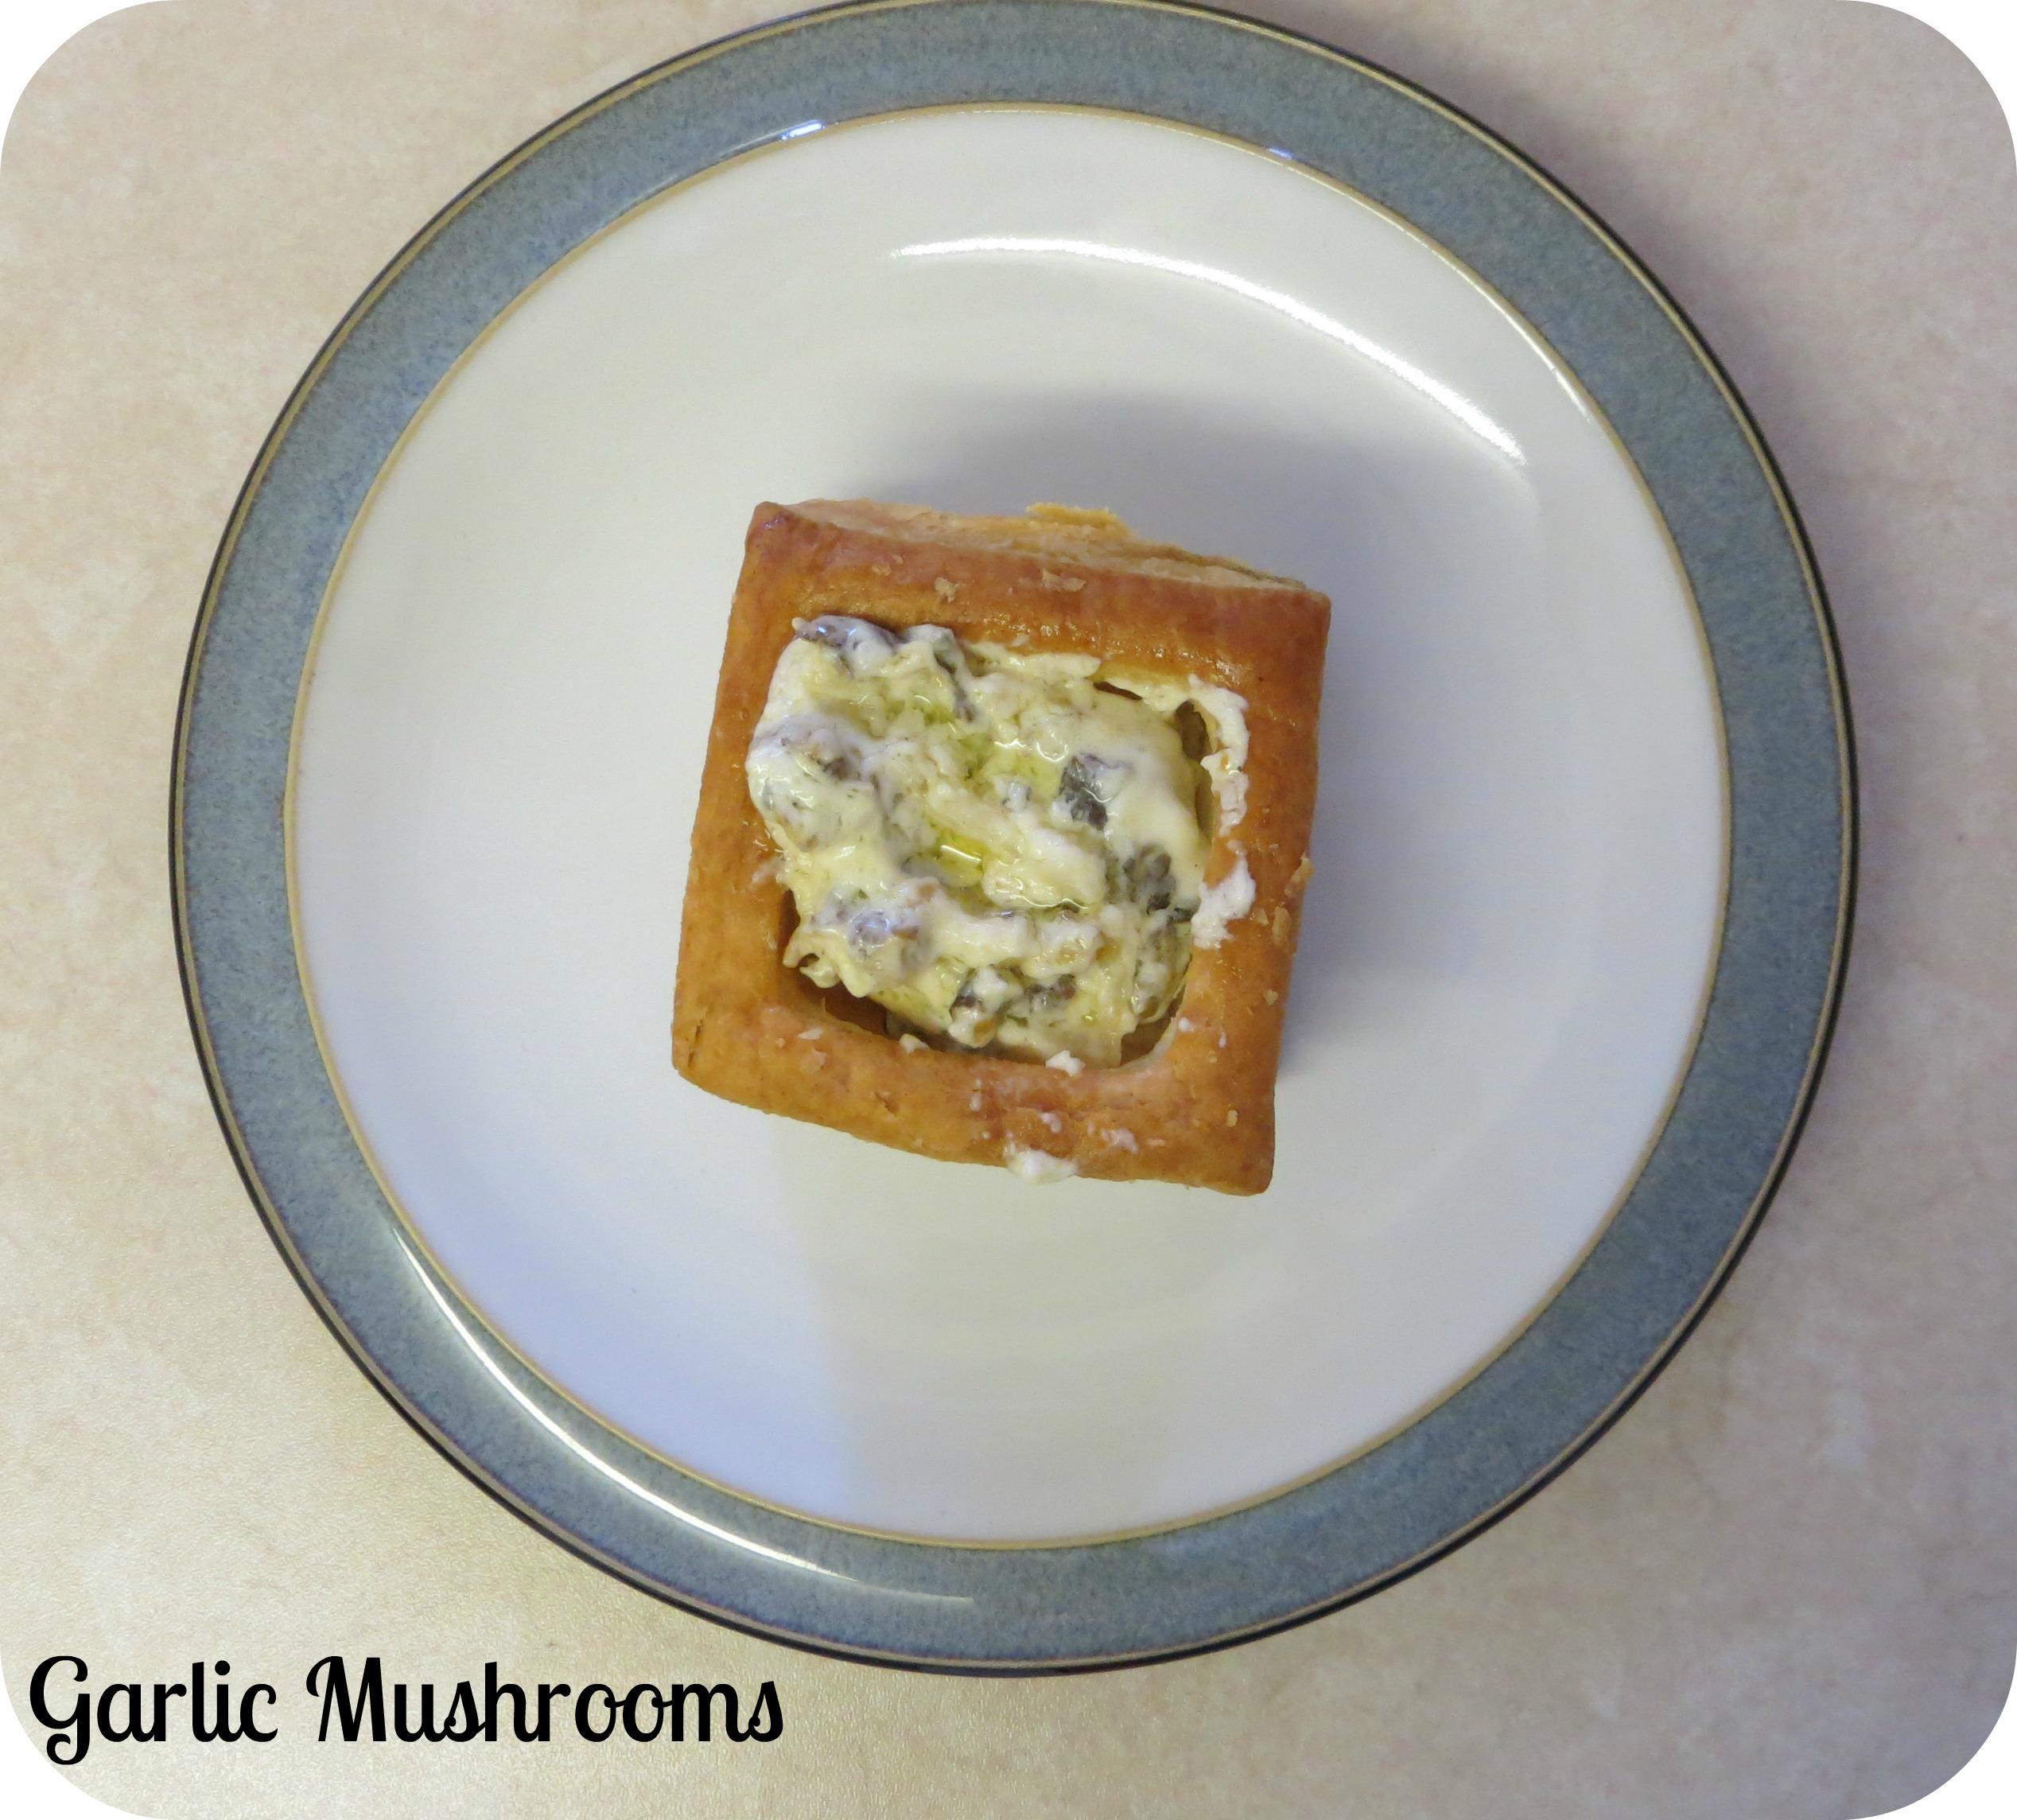 garlic mushroom